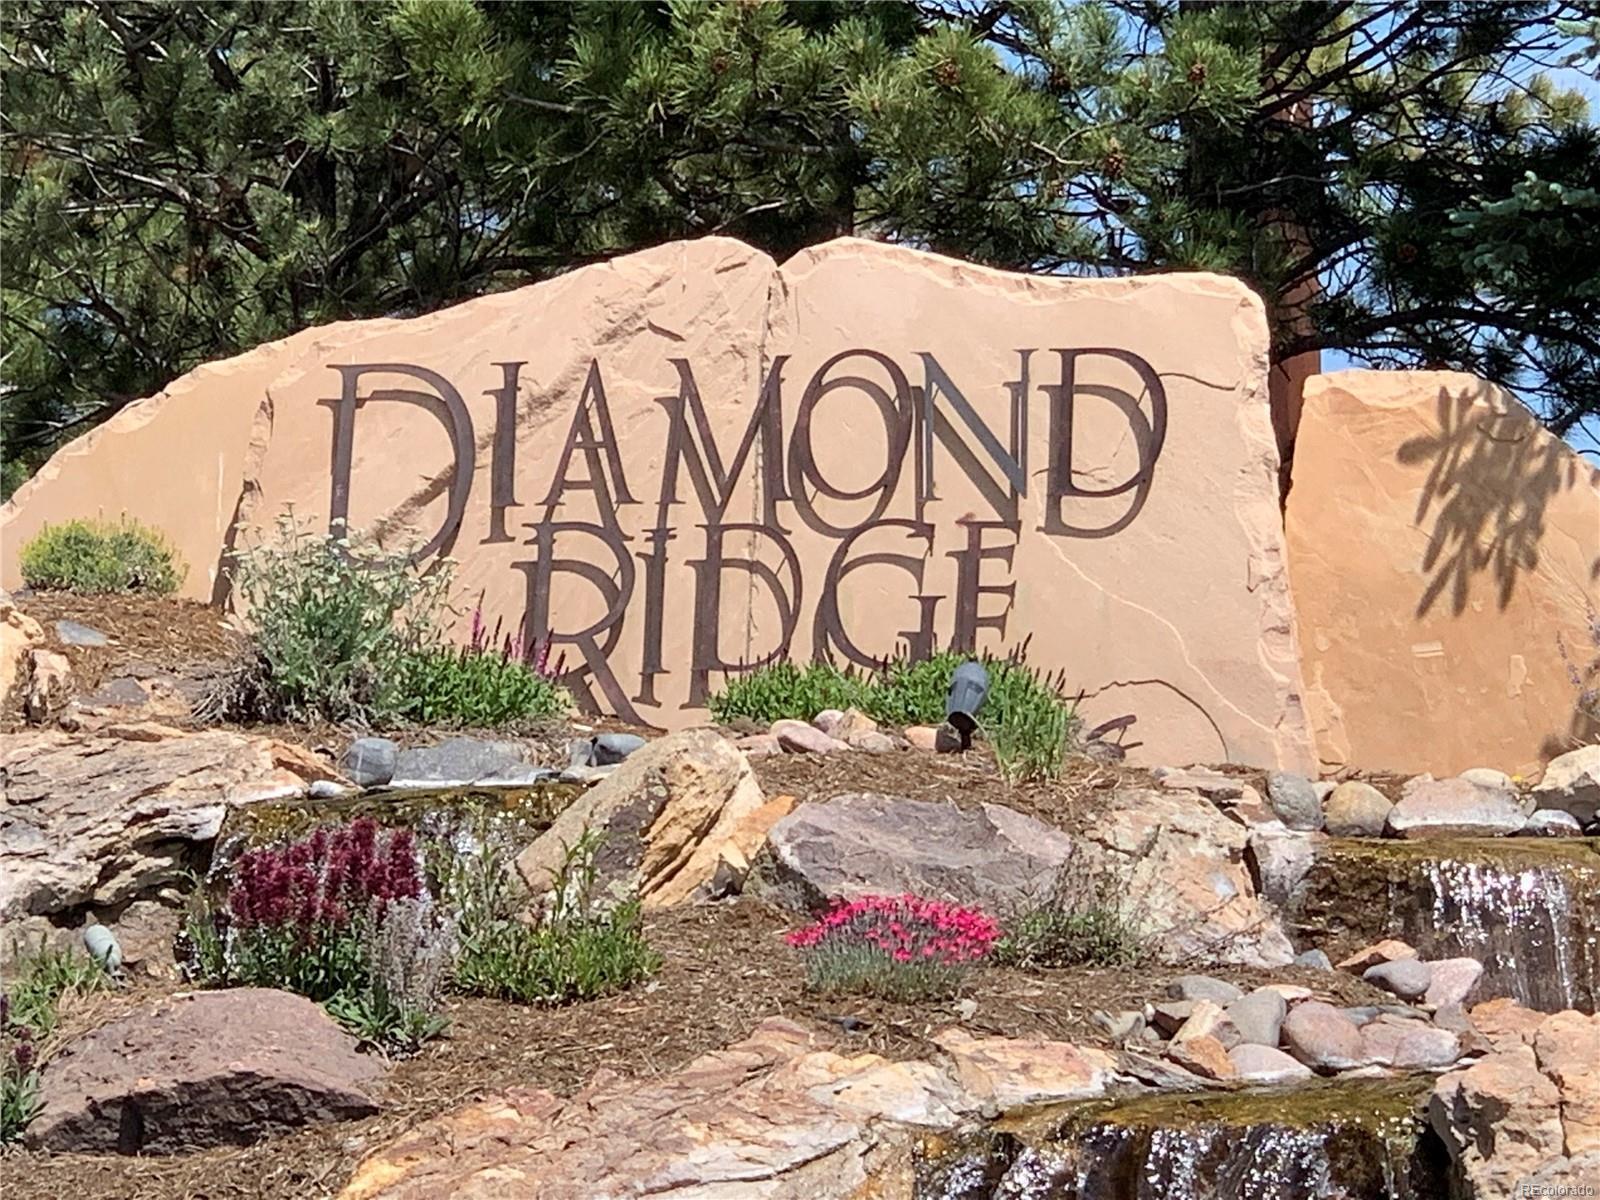 835 Diamond Ridge Circle, Castle Rock, CO 80108 - Castle Rock, CO real estate listing